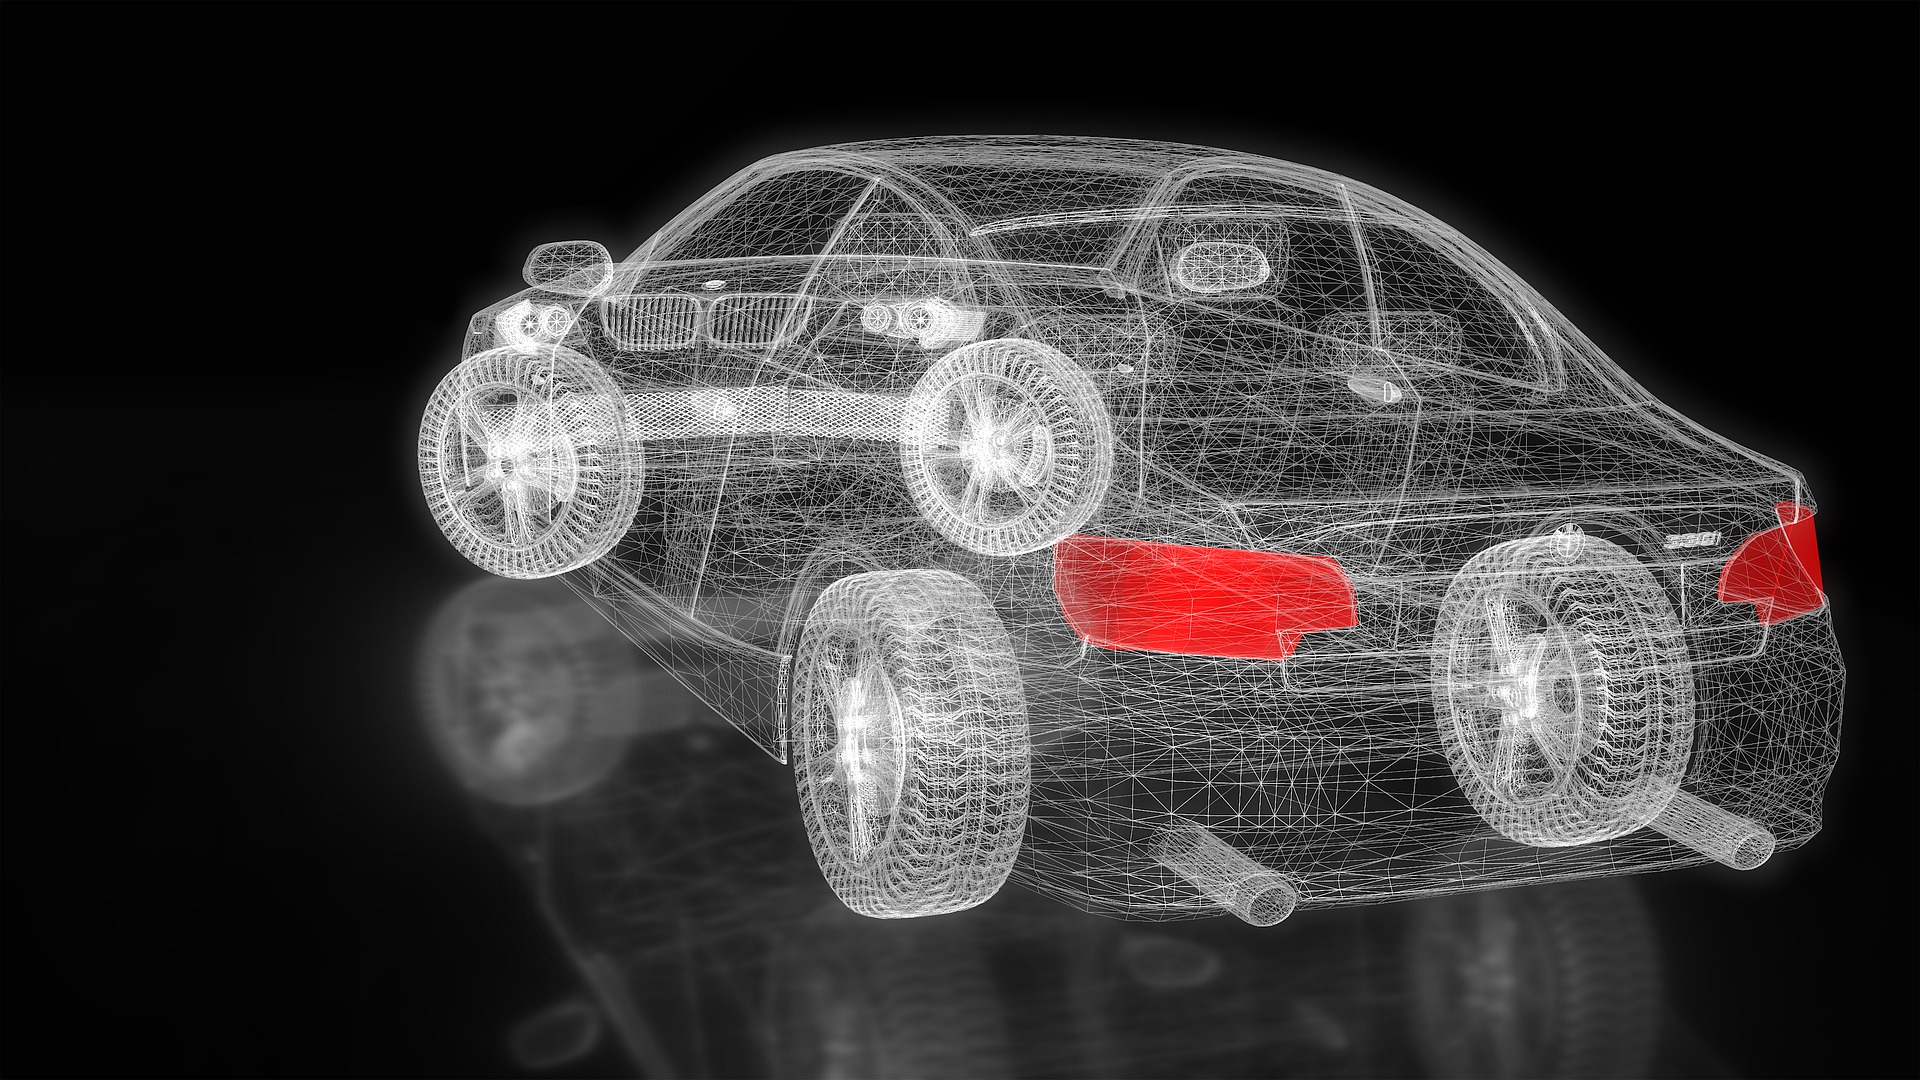 Image of translucent car